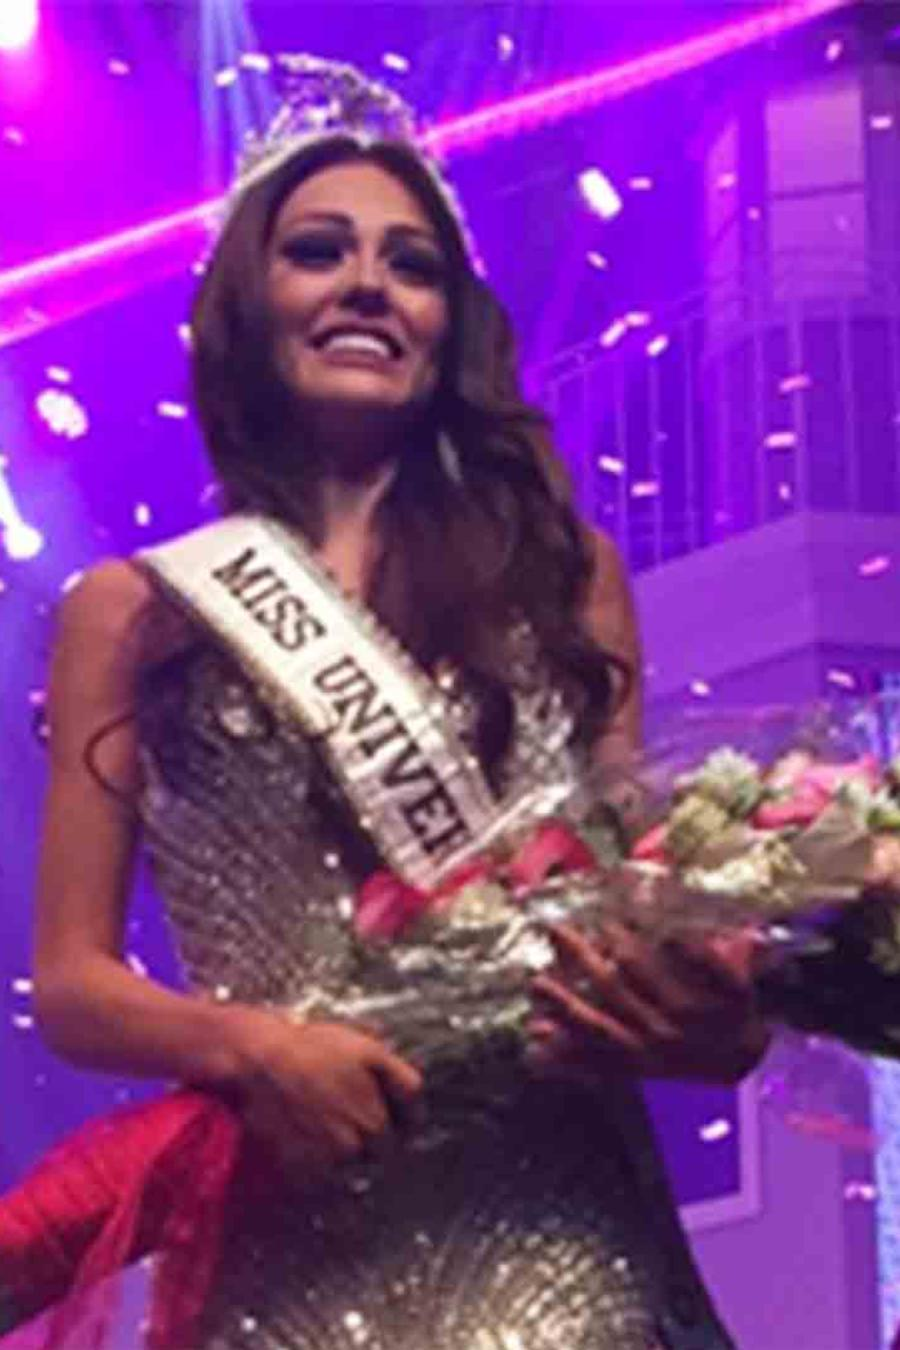 Kristhielee Caride gana Miss Puerto Rico 2016